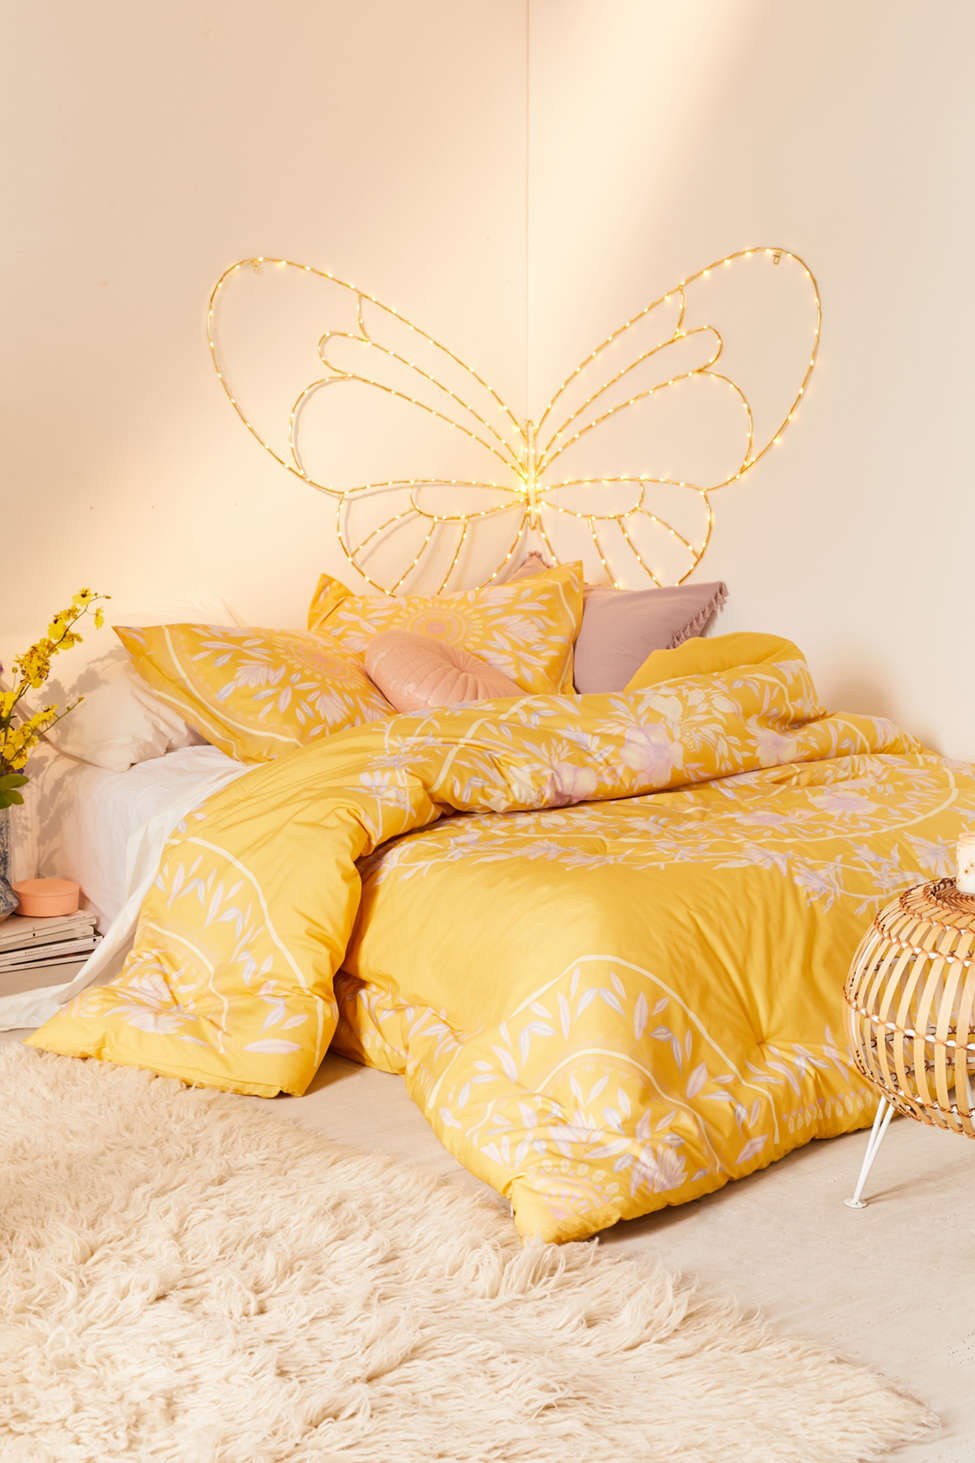 Slide View: 2: Iris Sketched Floral Comforter Snooze Set